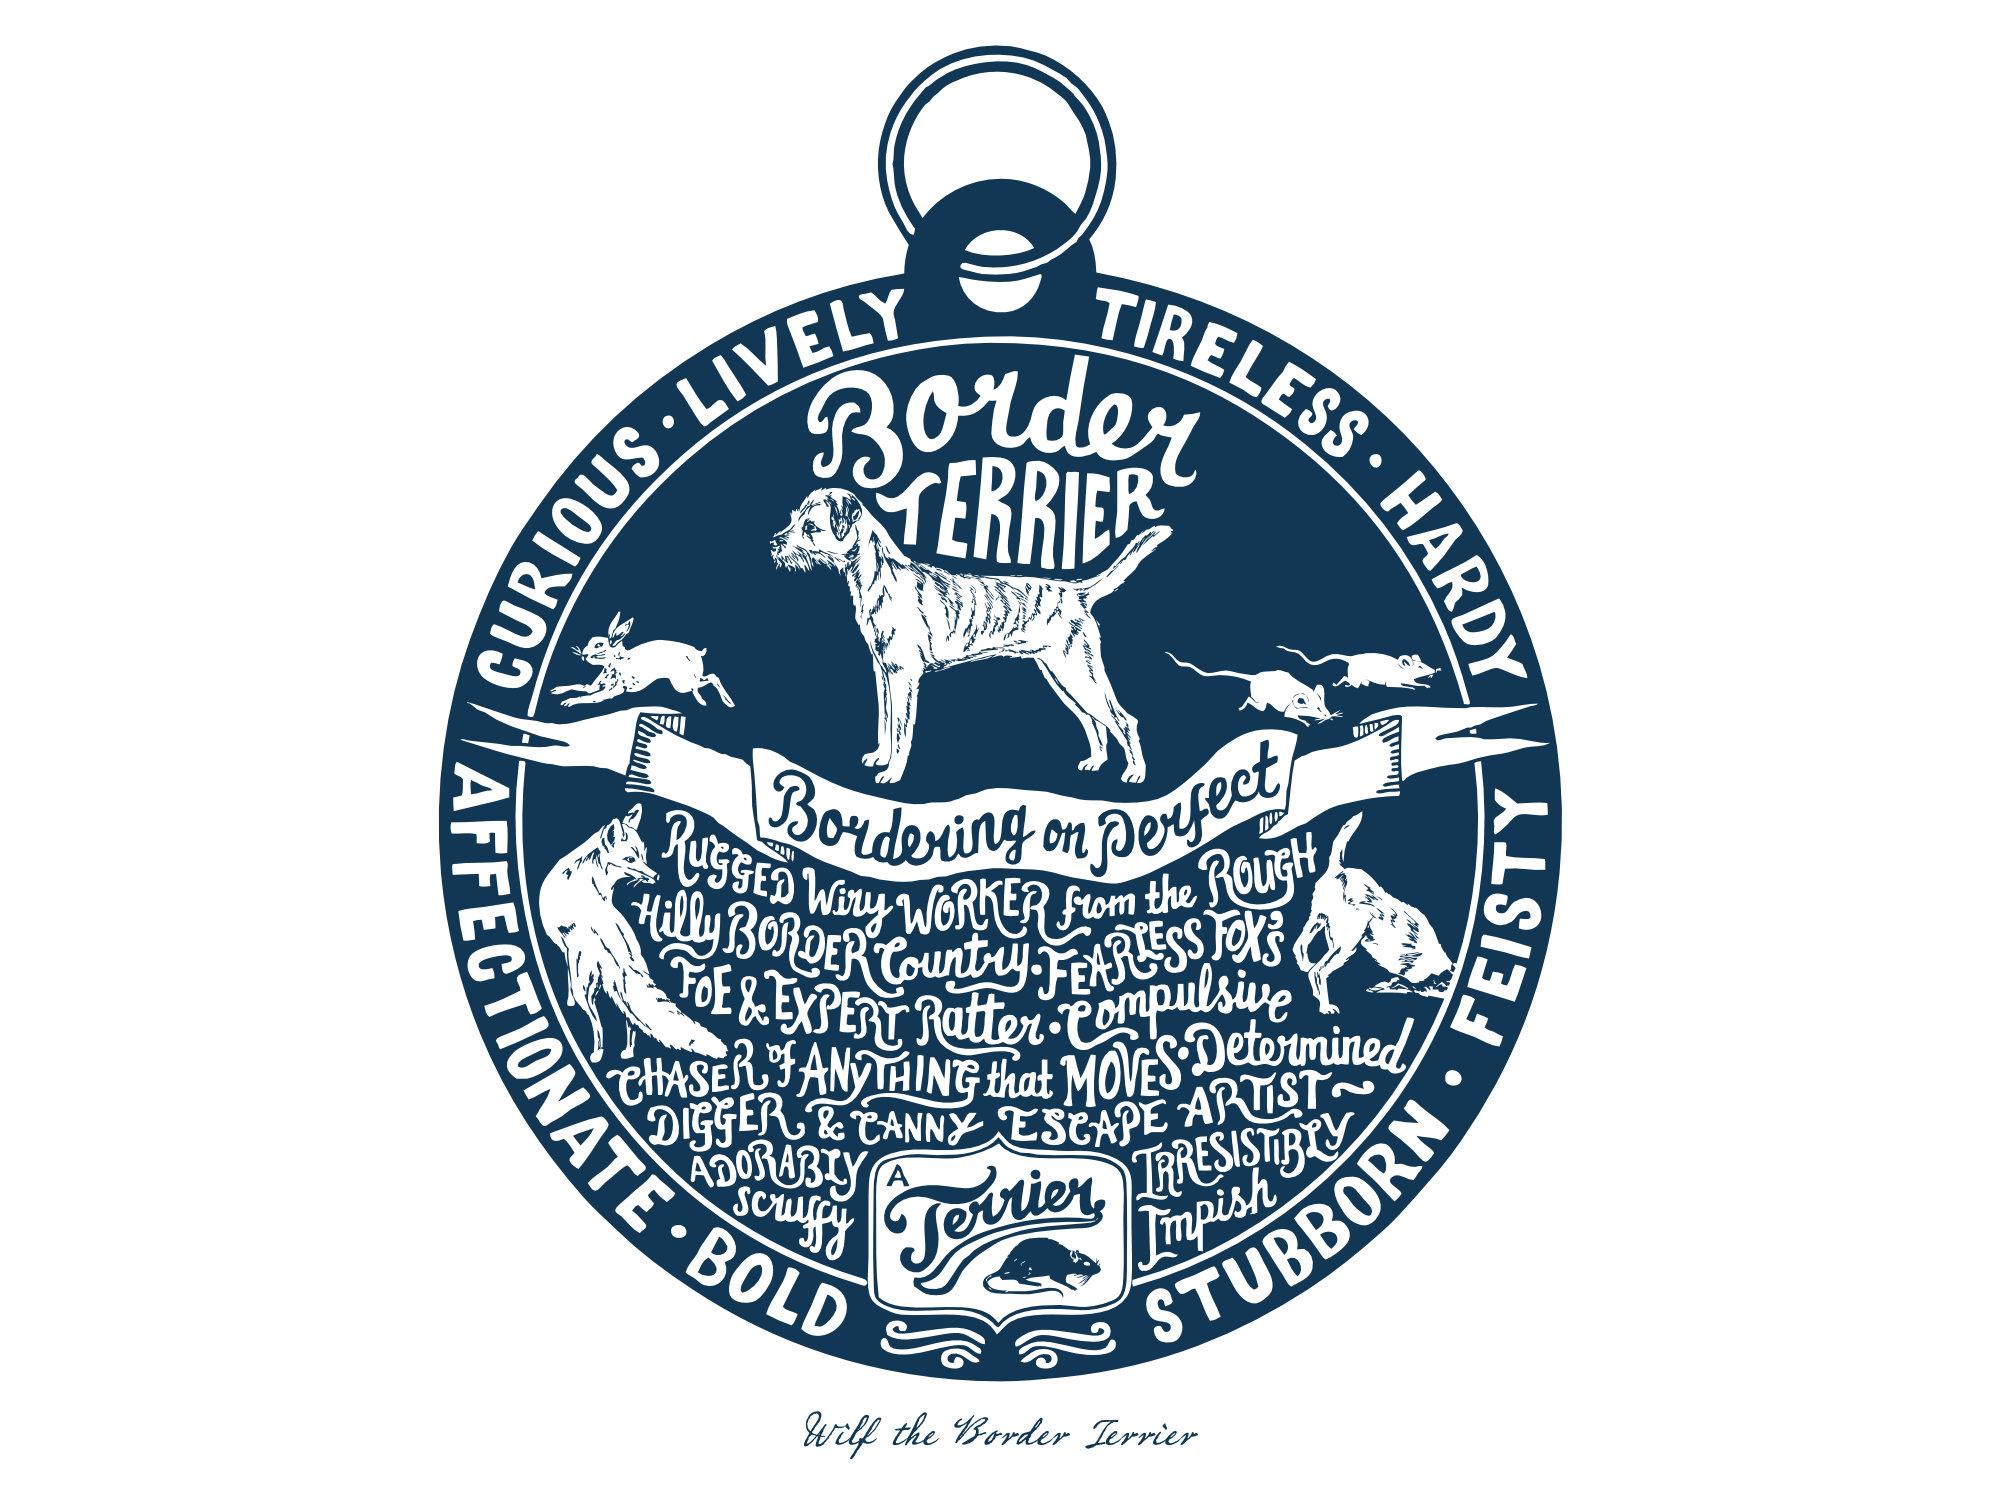 Border Terrier print - Hand lettering & Illustration by Debbie Kendall